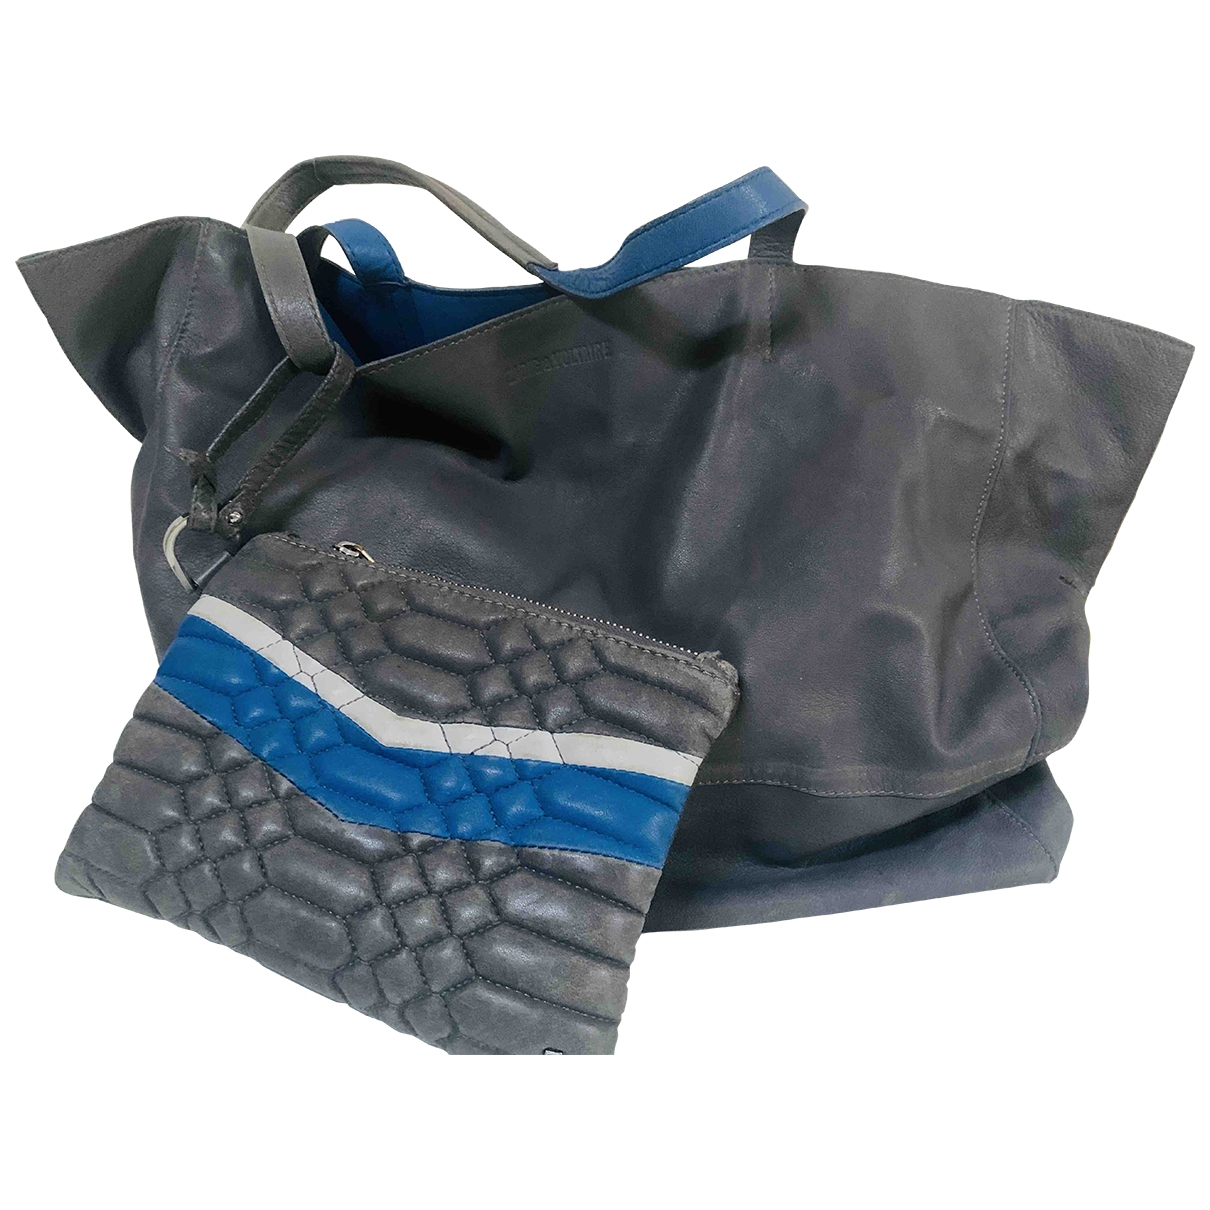 Zadig & Voltaire \N Handtasche in  Grau Leder